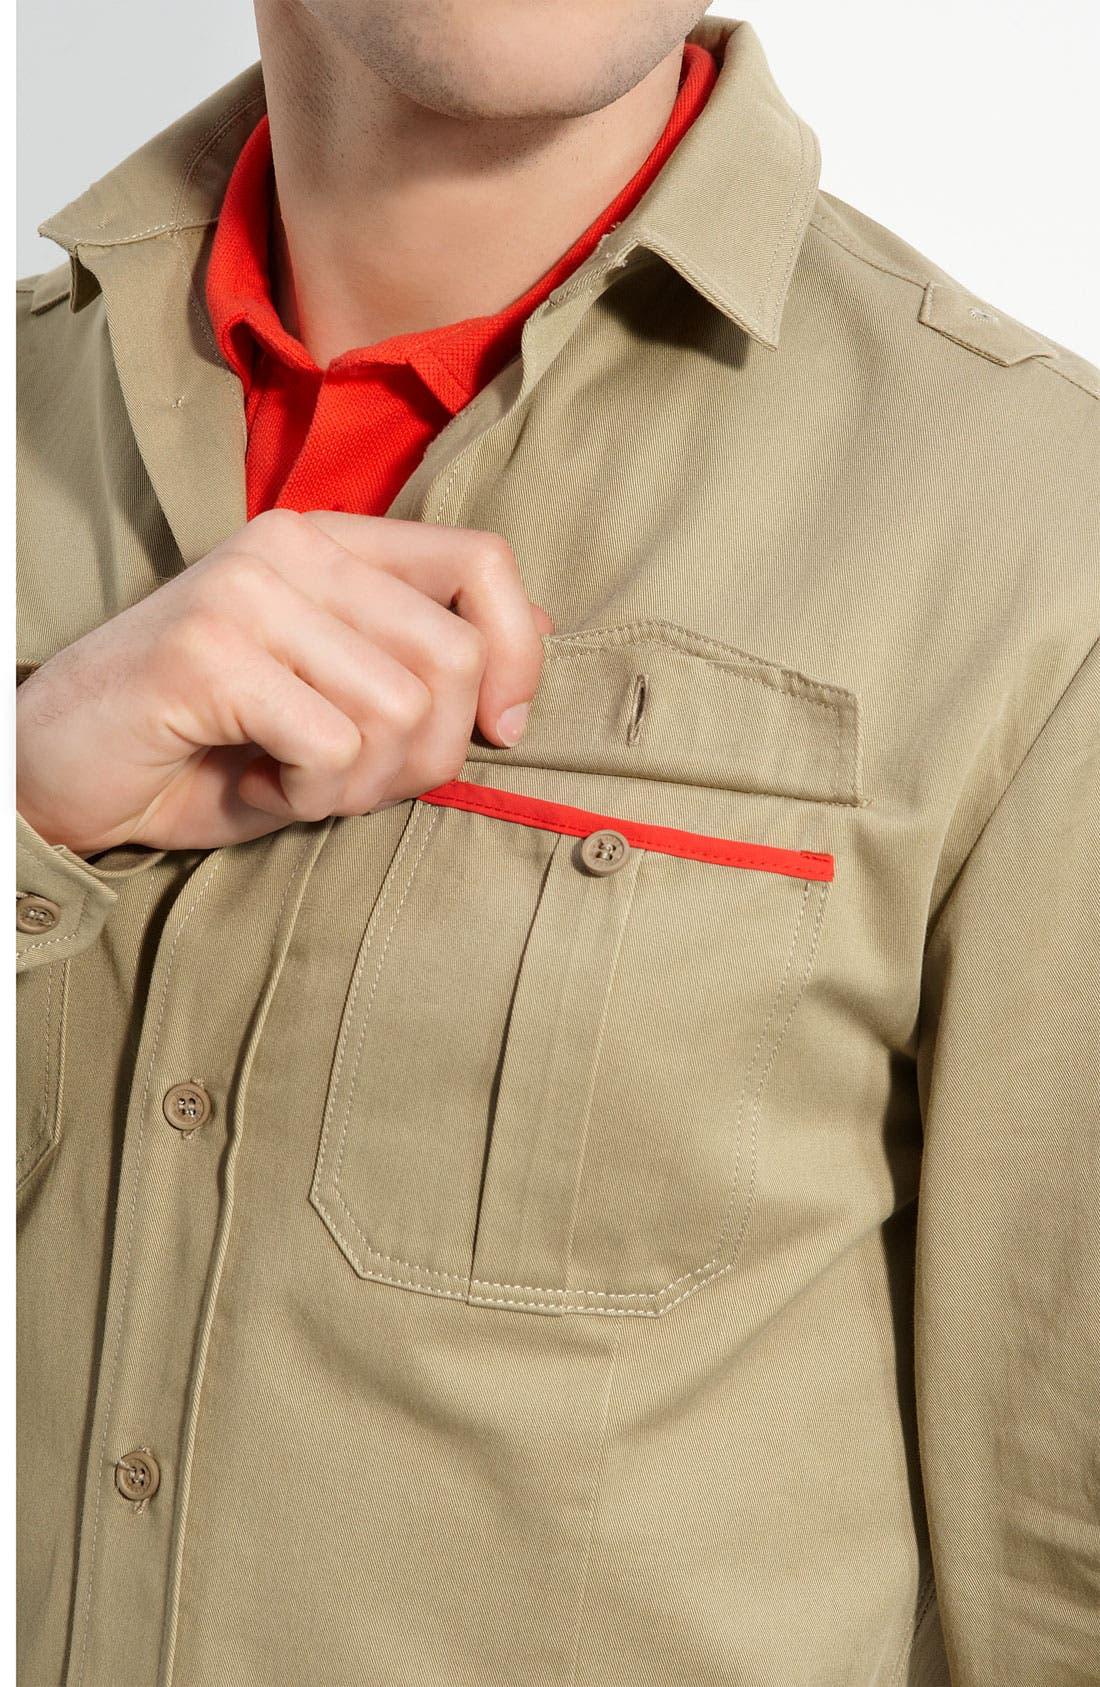 Alternate Image 2  - Orlebar Brown 'Dexter' Shirt Jacket